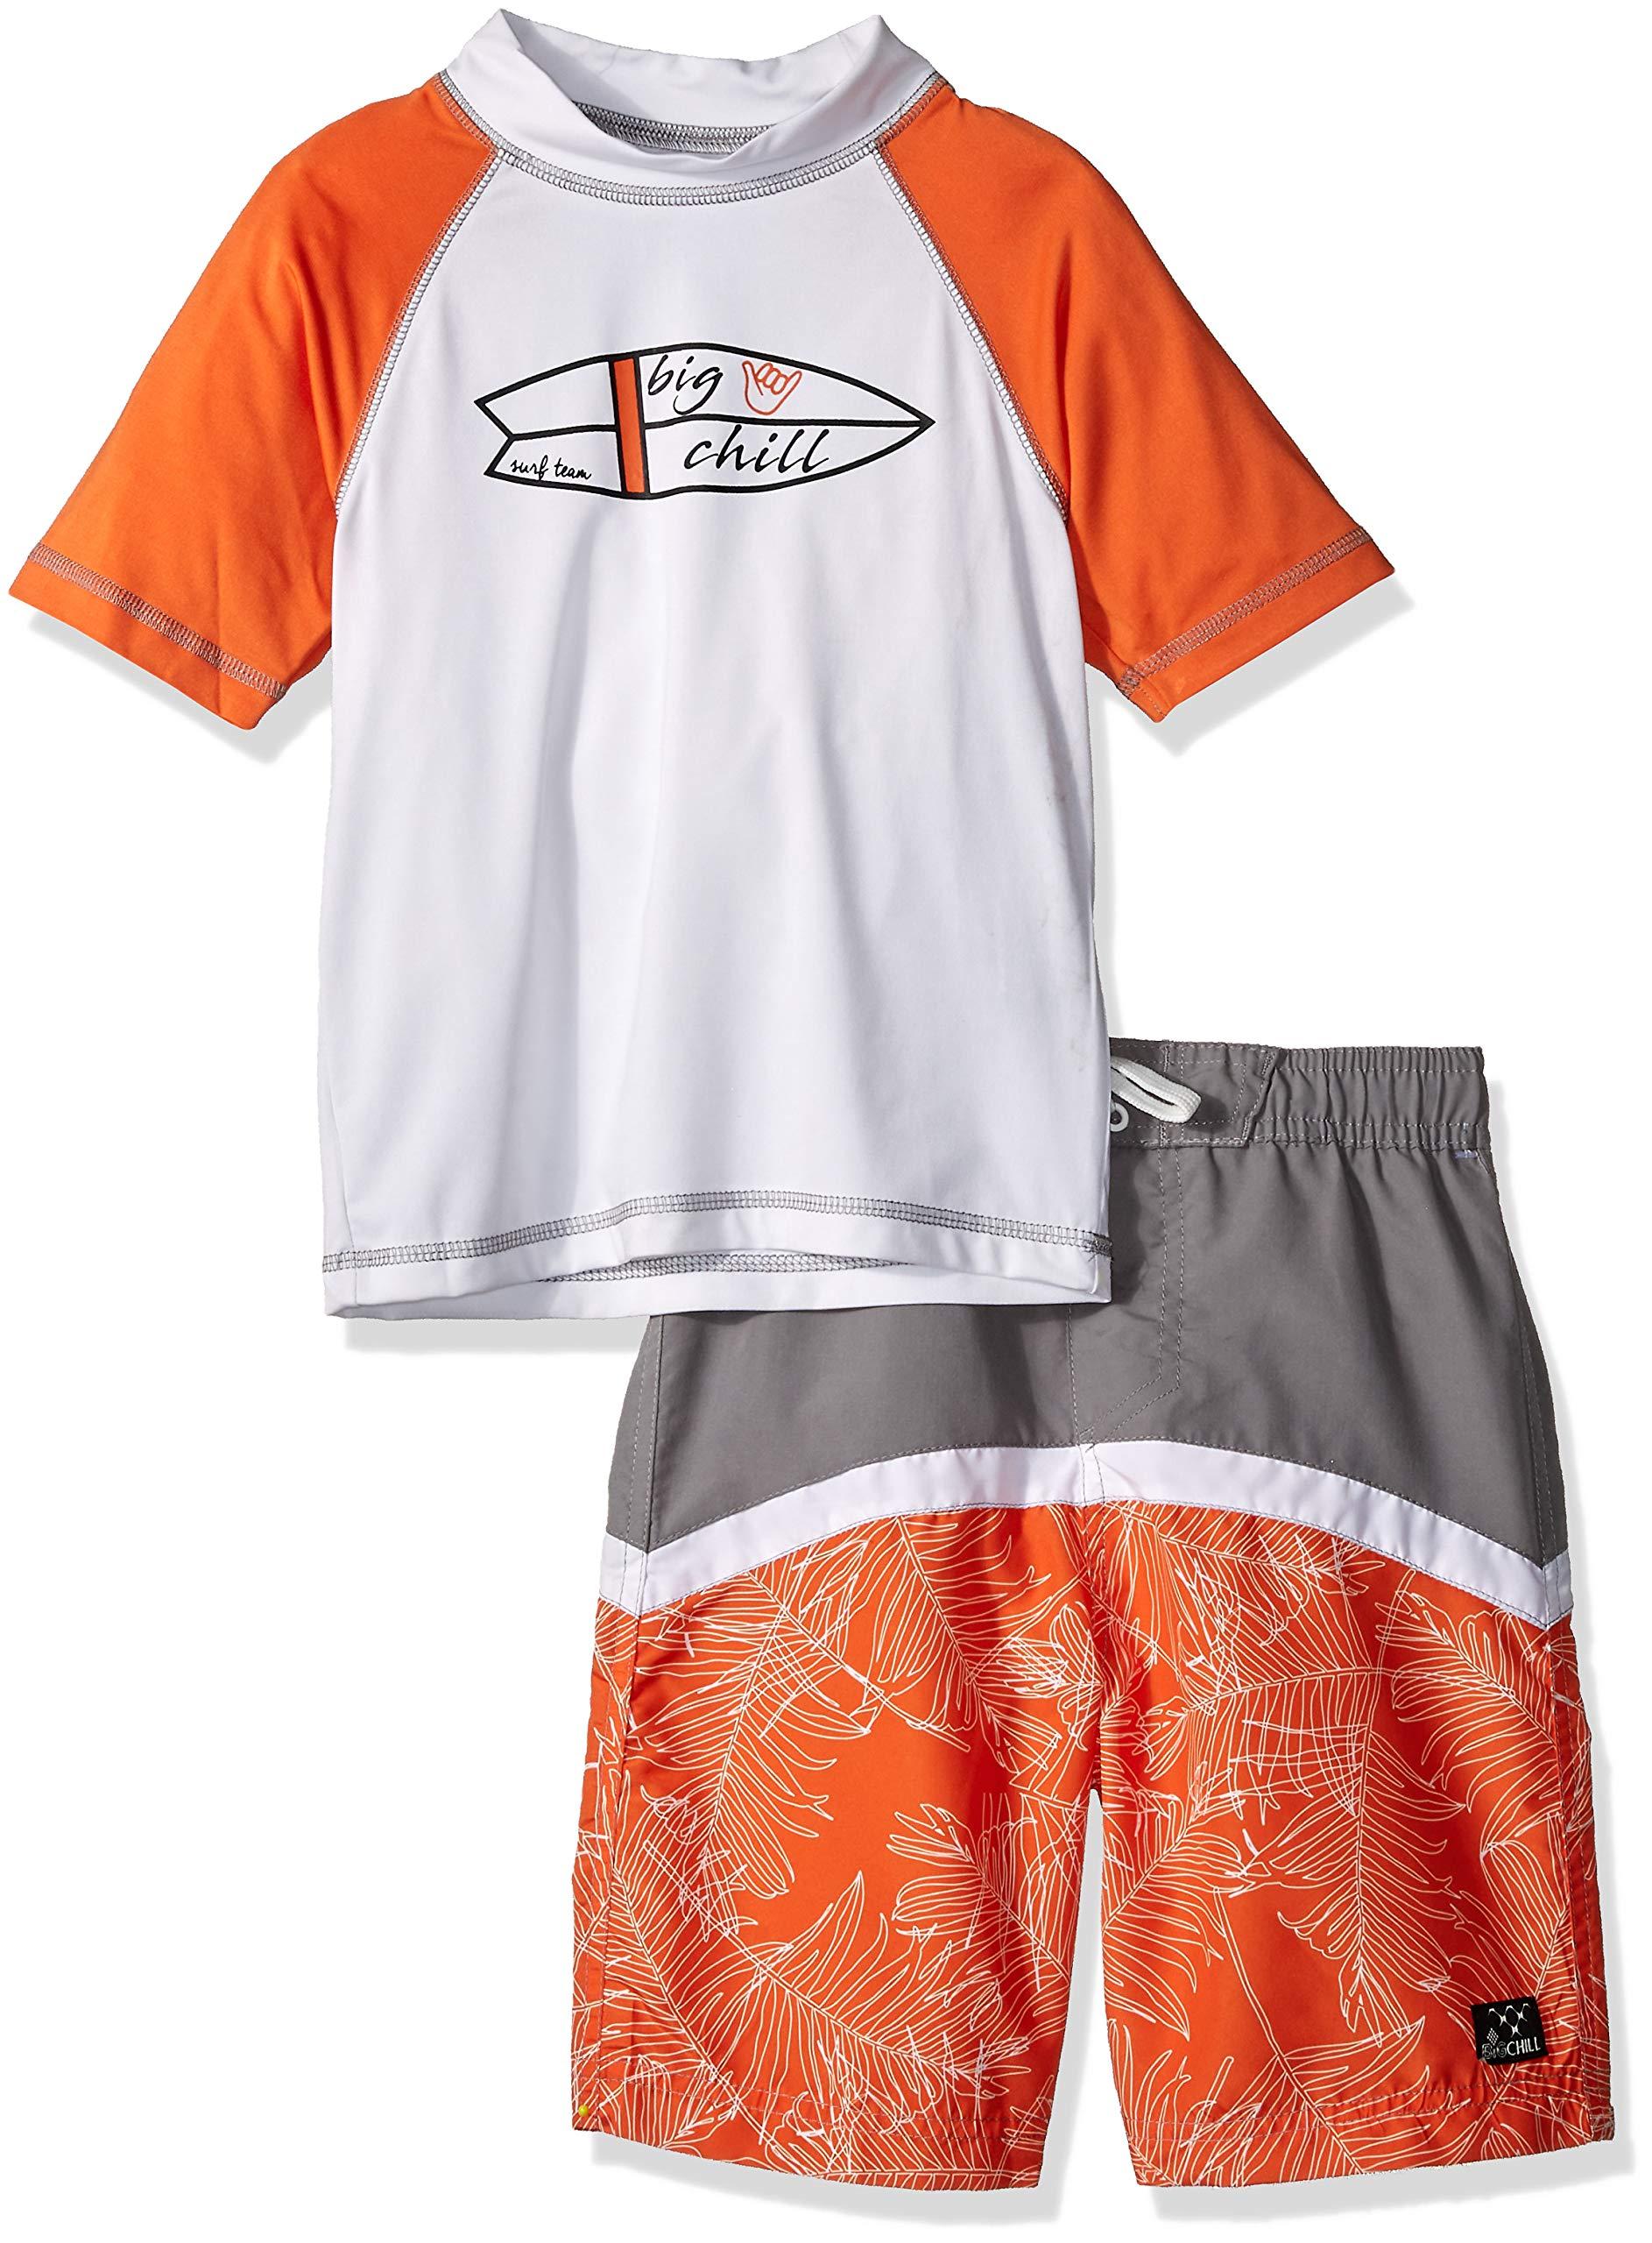 Big Chill Little Boys' Short Sleeve Rashguard Sets, surf Grey, 7